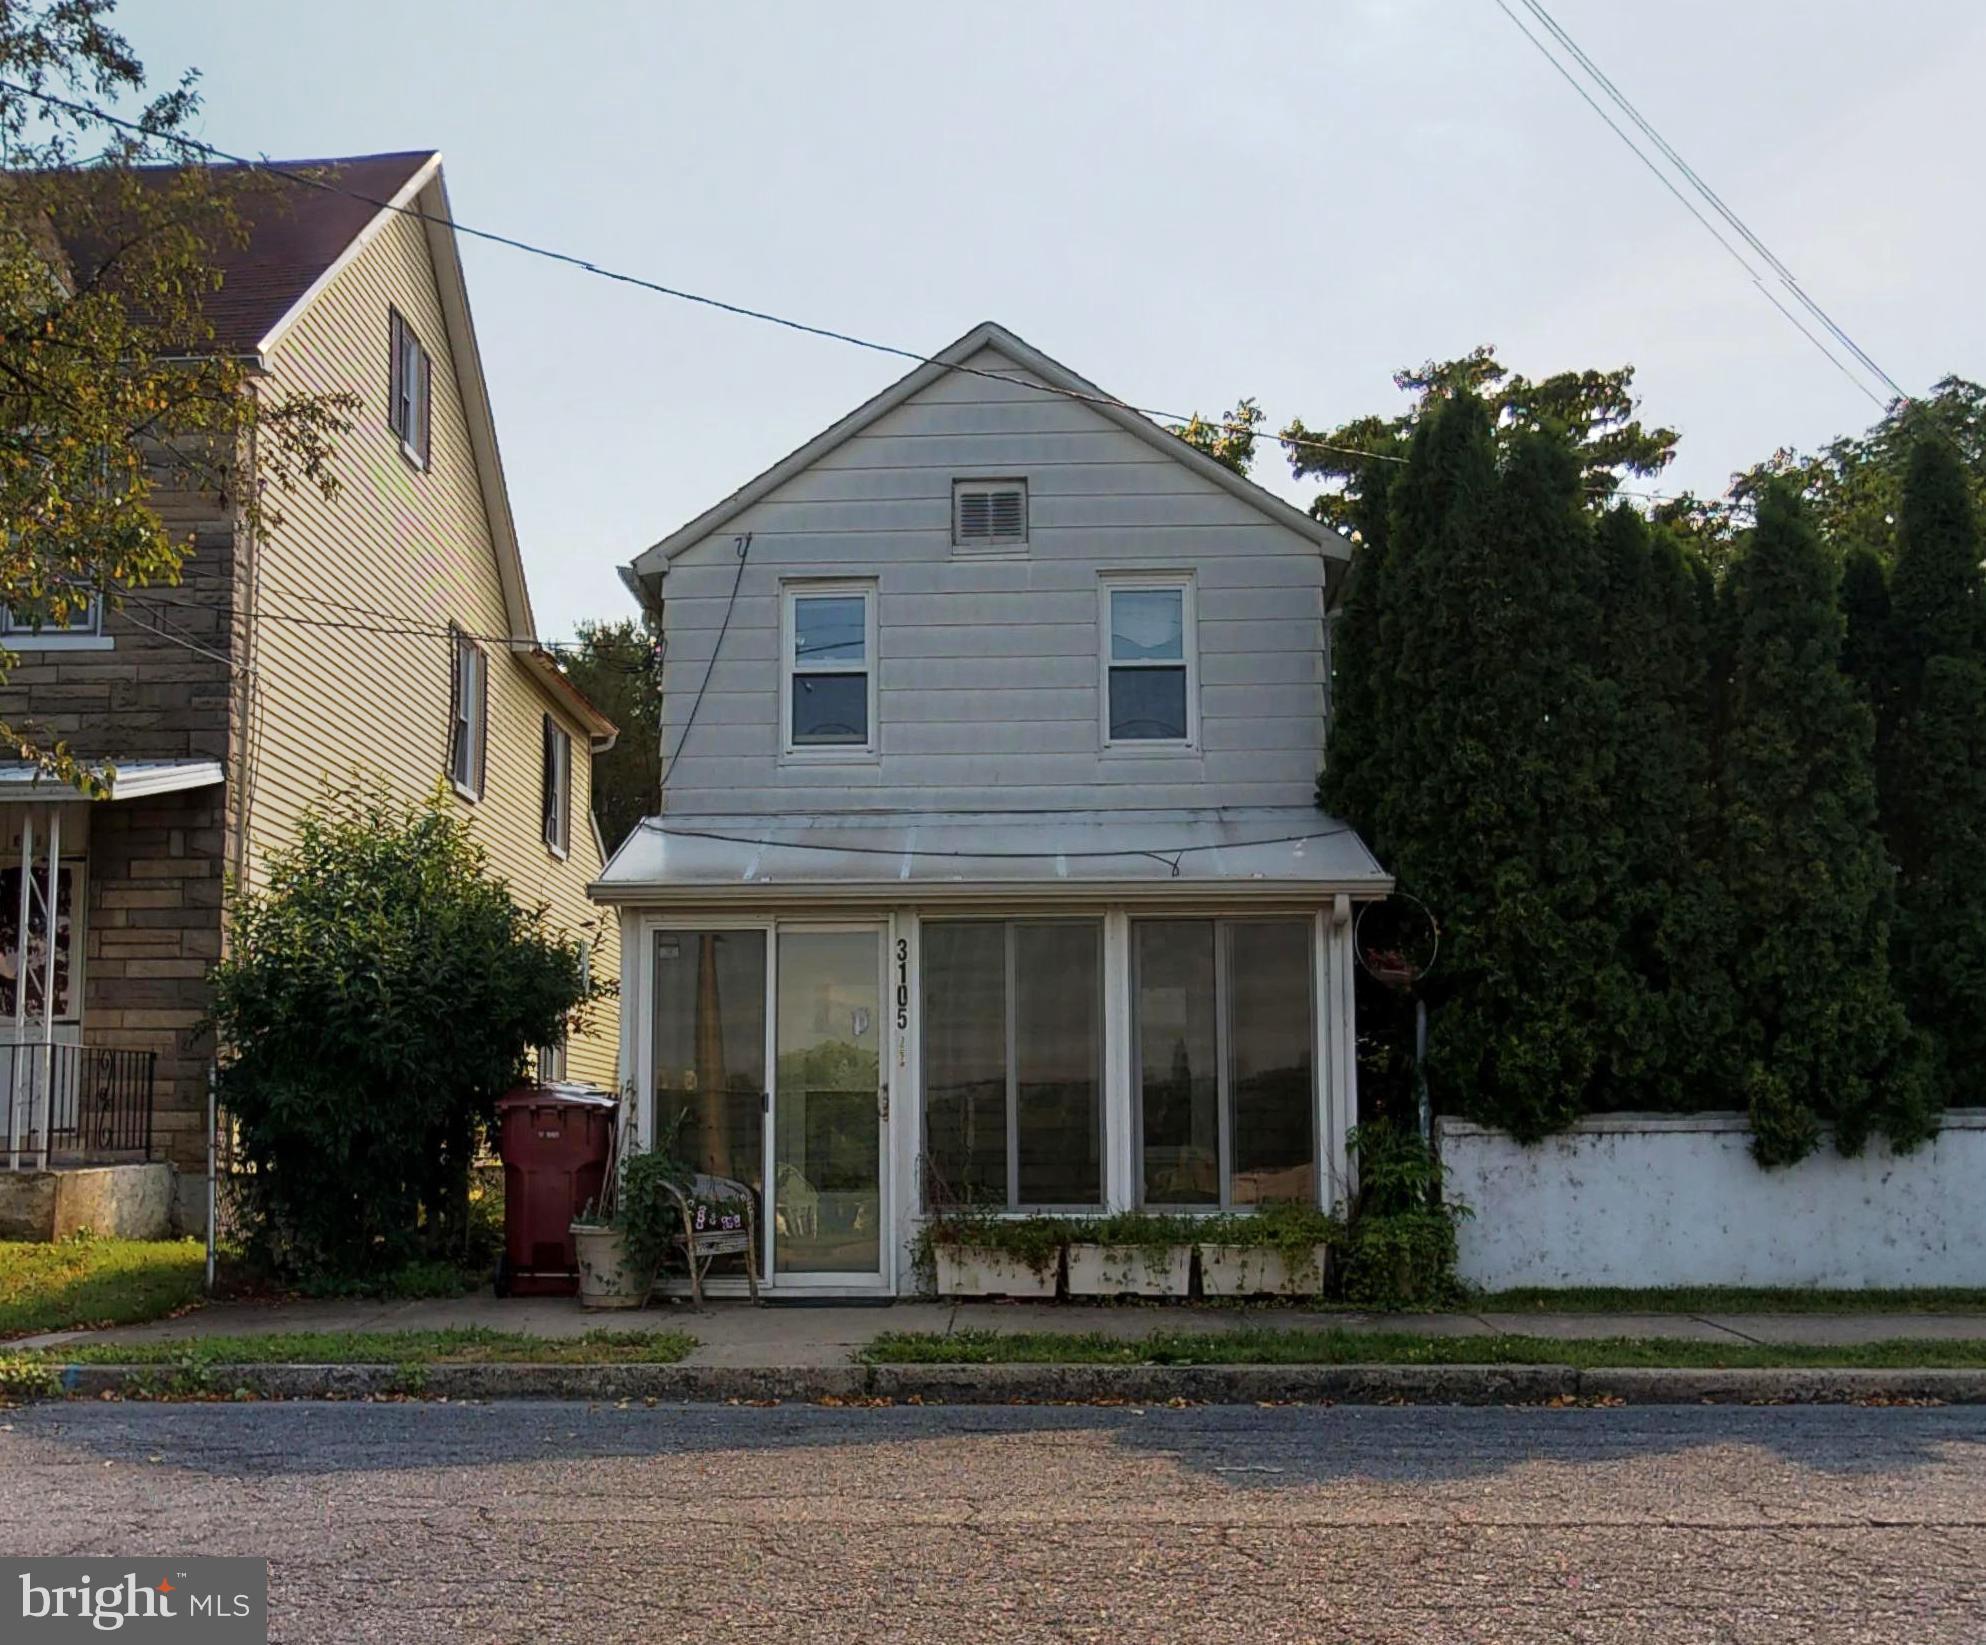 3105 S 2ND STREET, WHITEHALL, PA 18052